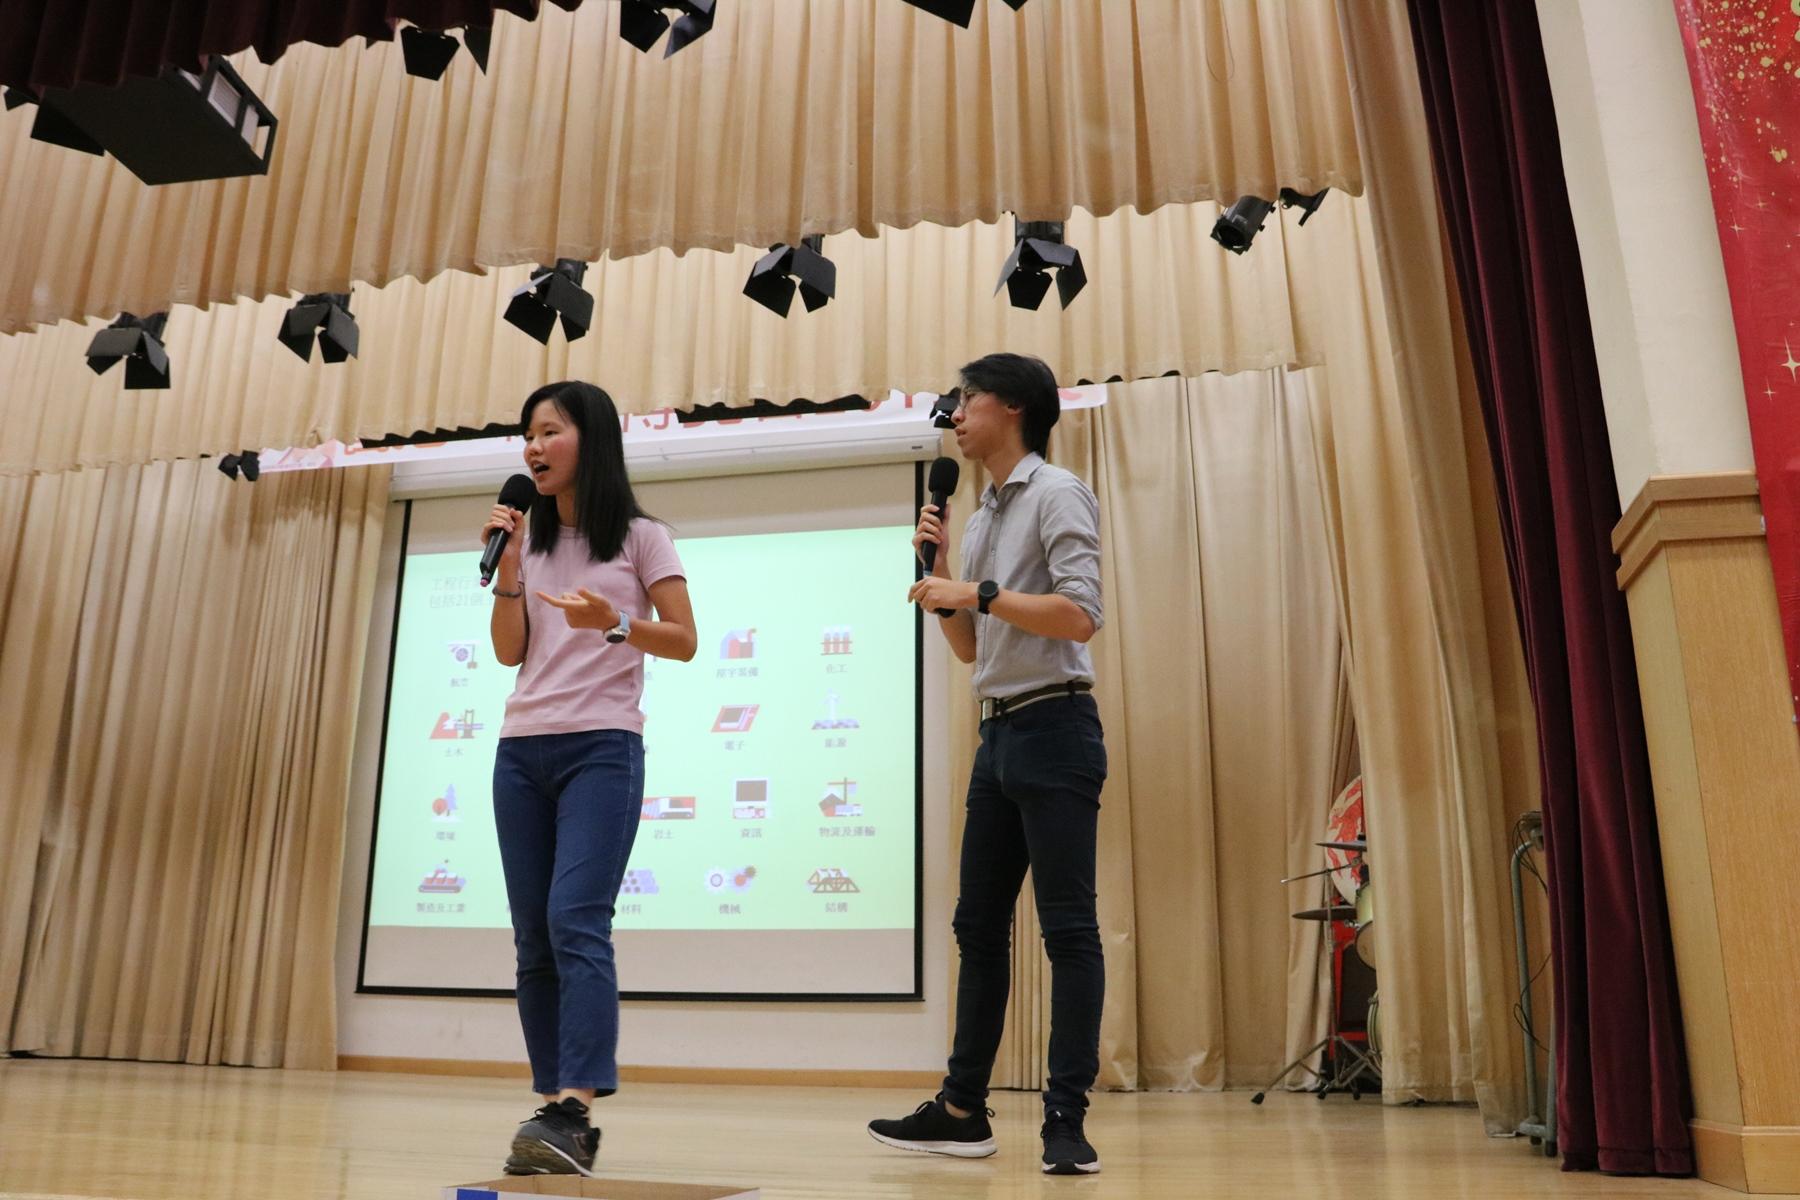 http://npc.edu.hk/sites/default/files/img_6795_1.jpg